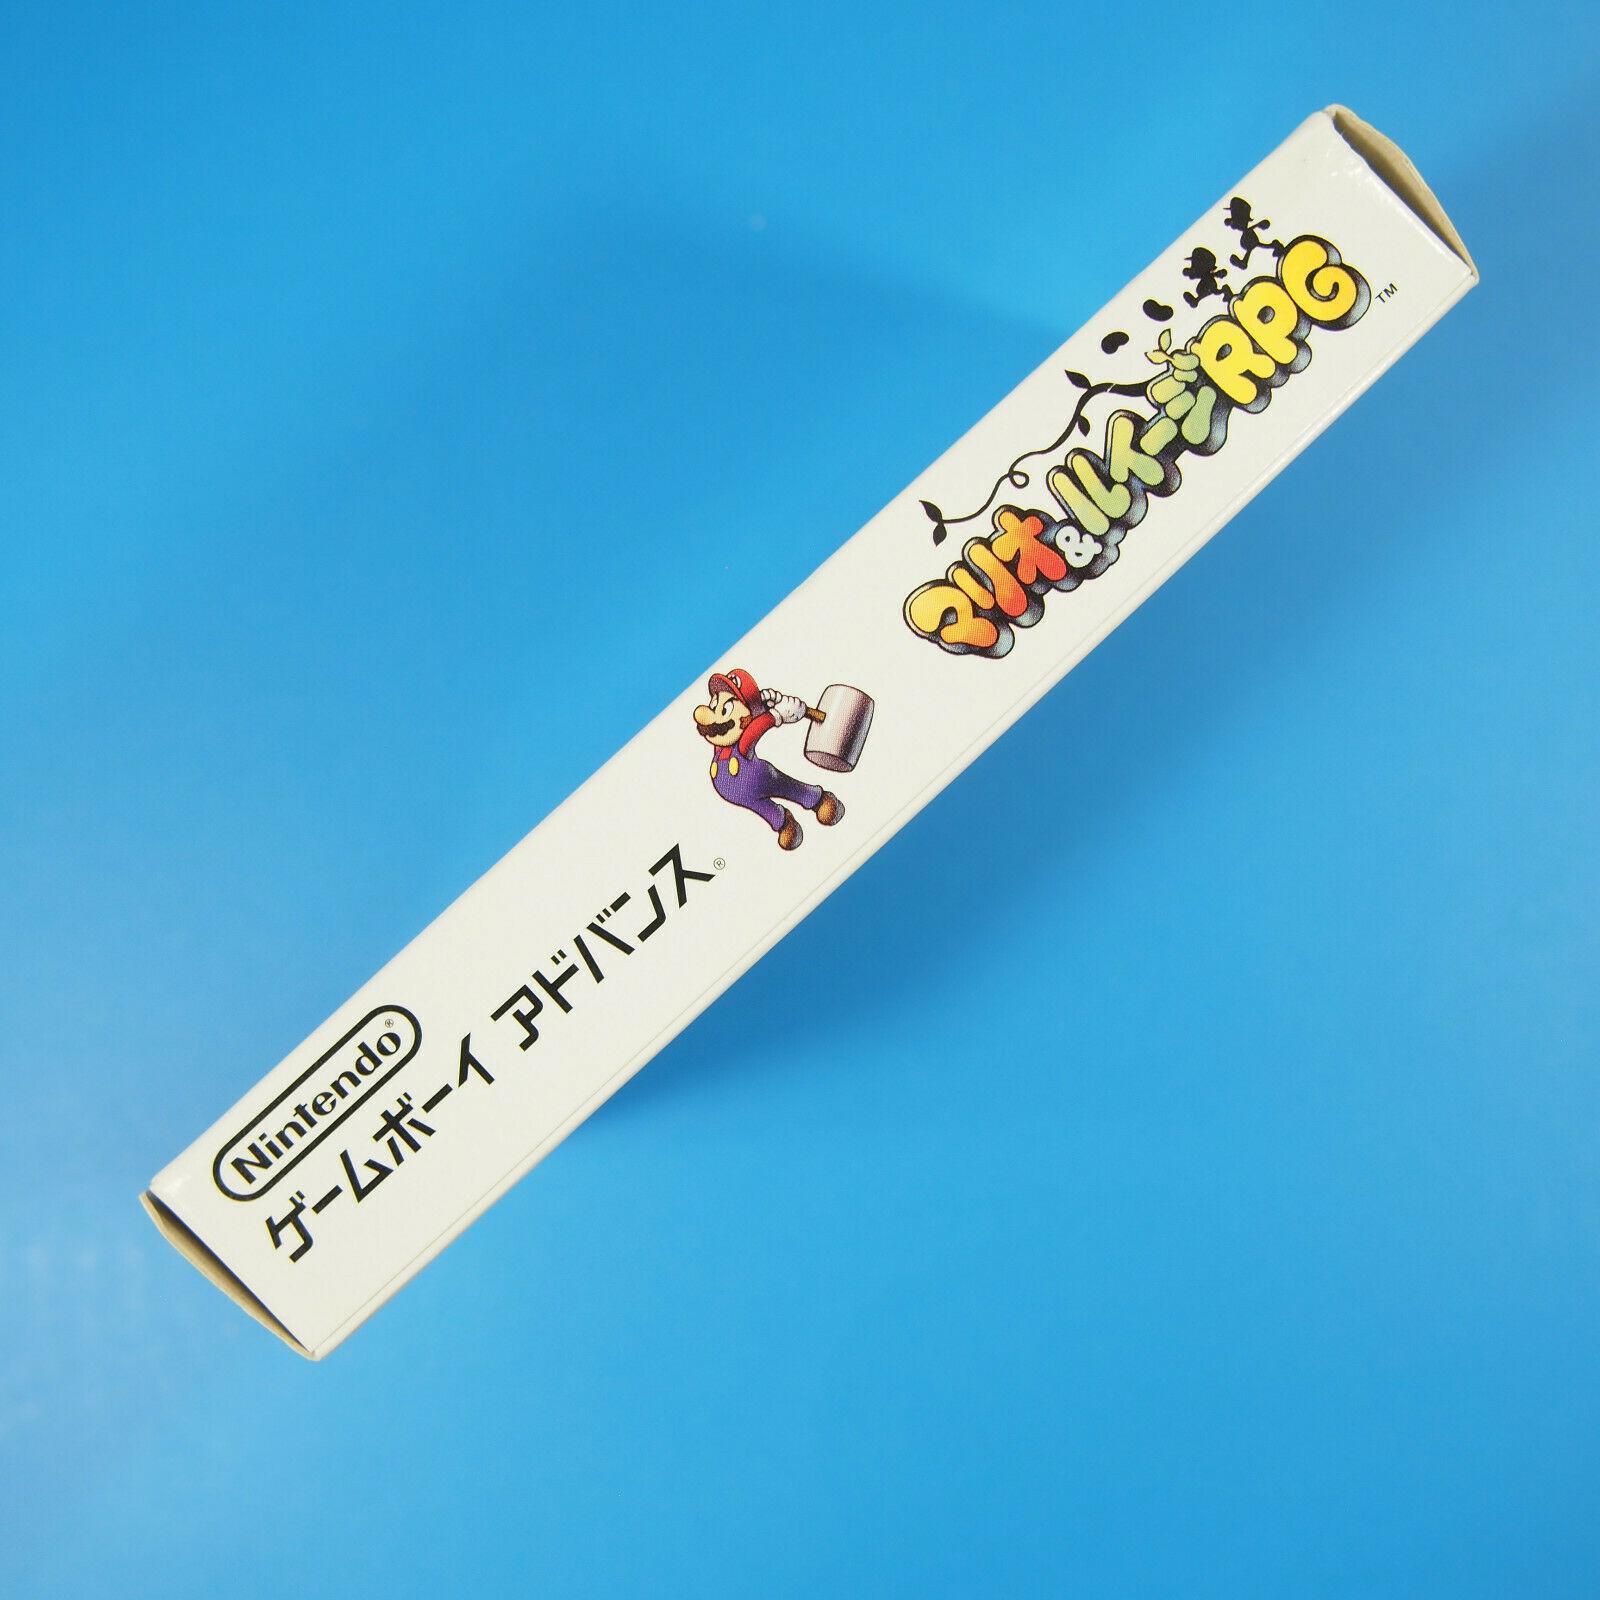 Mario & Luigi Super Star Complete Box (Nintendo Gameboy Advancd GBA, 2003) Japan